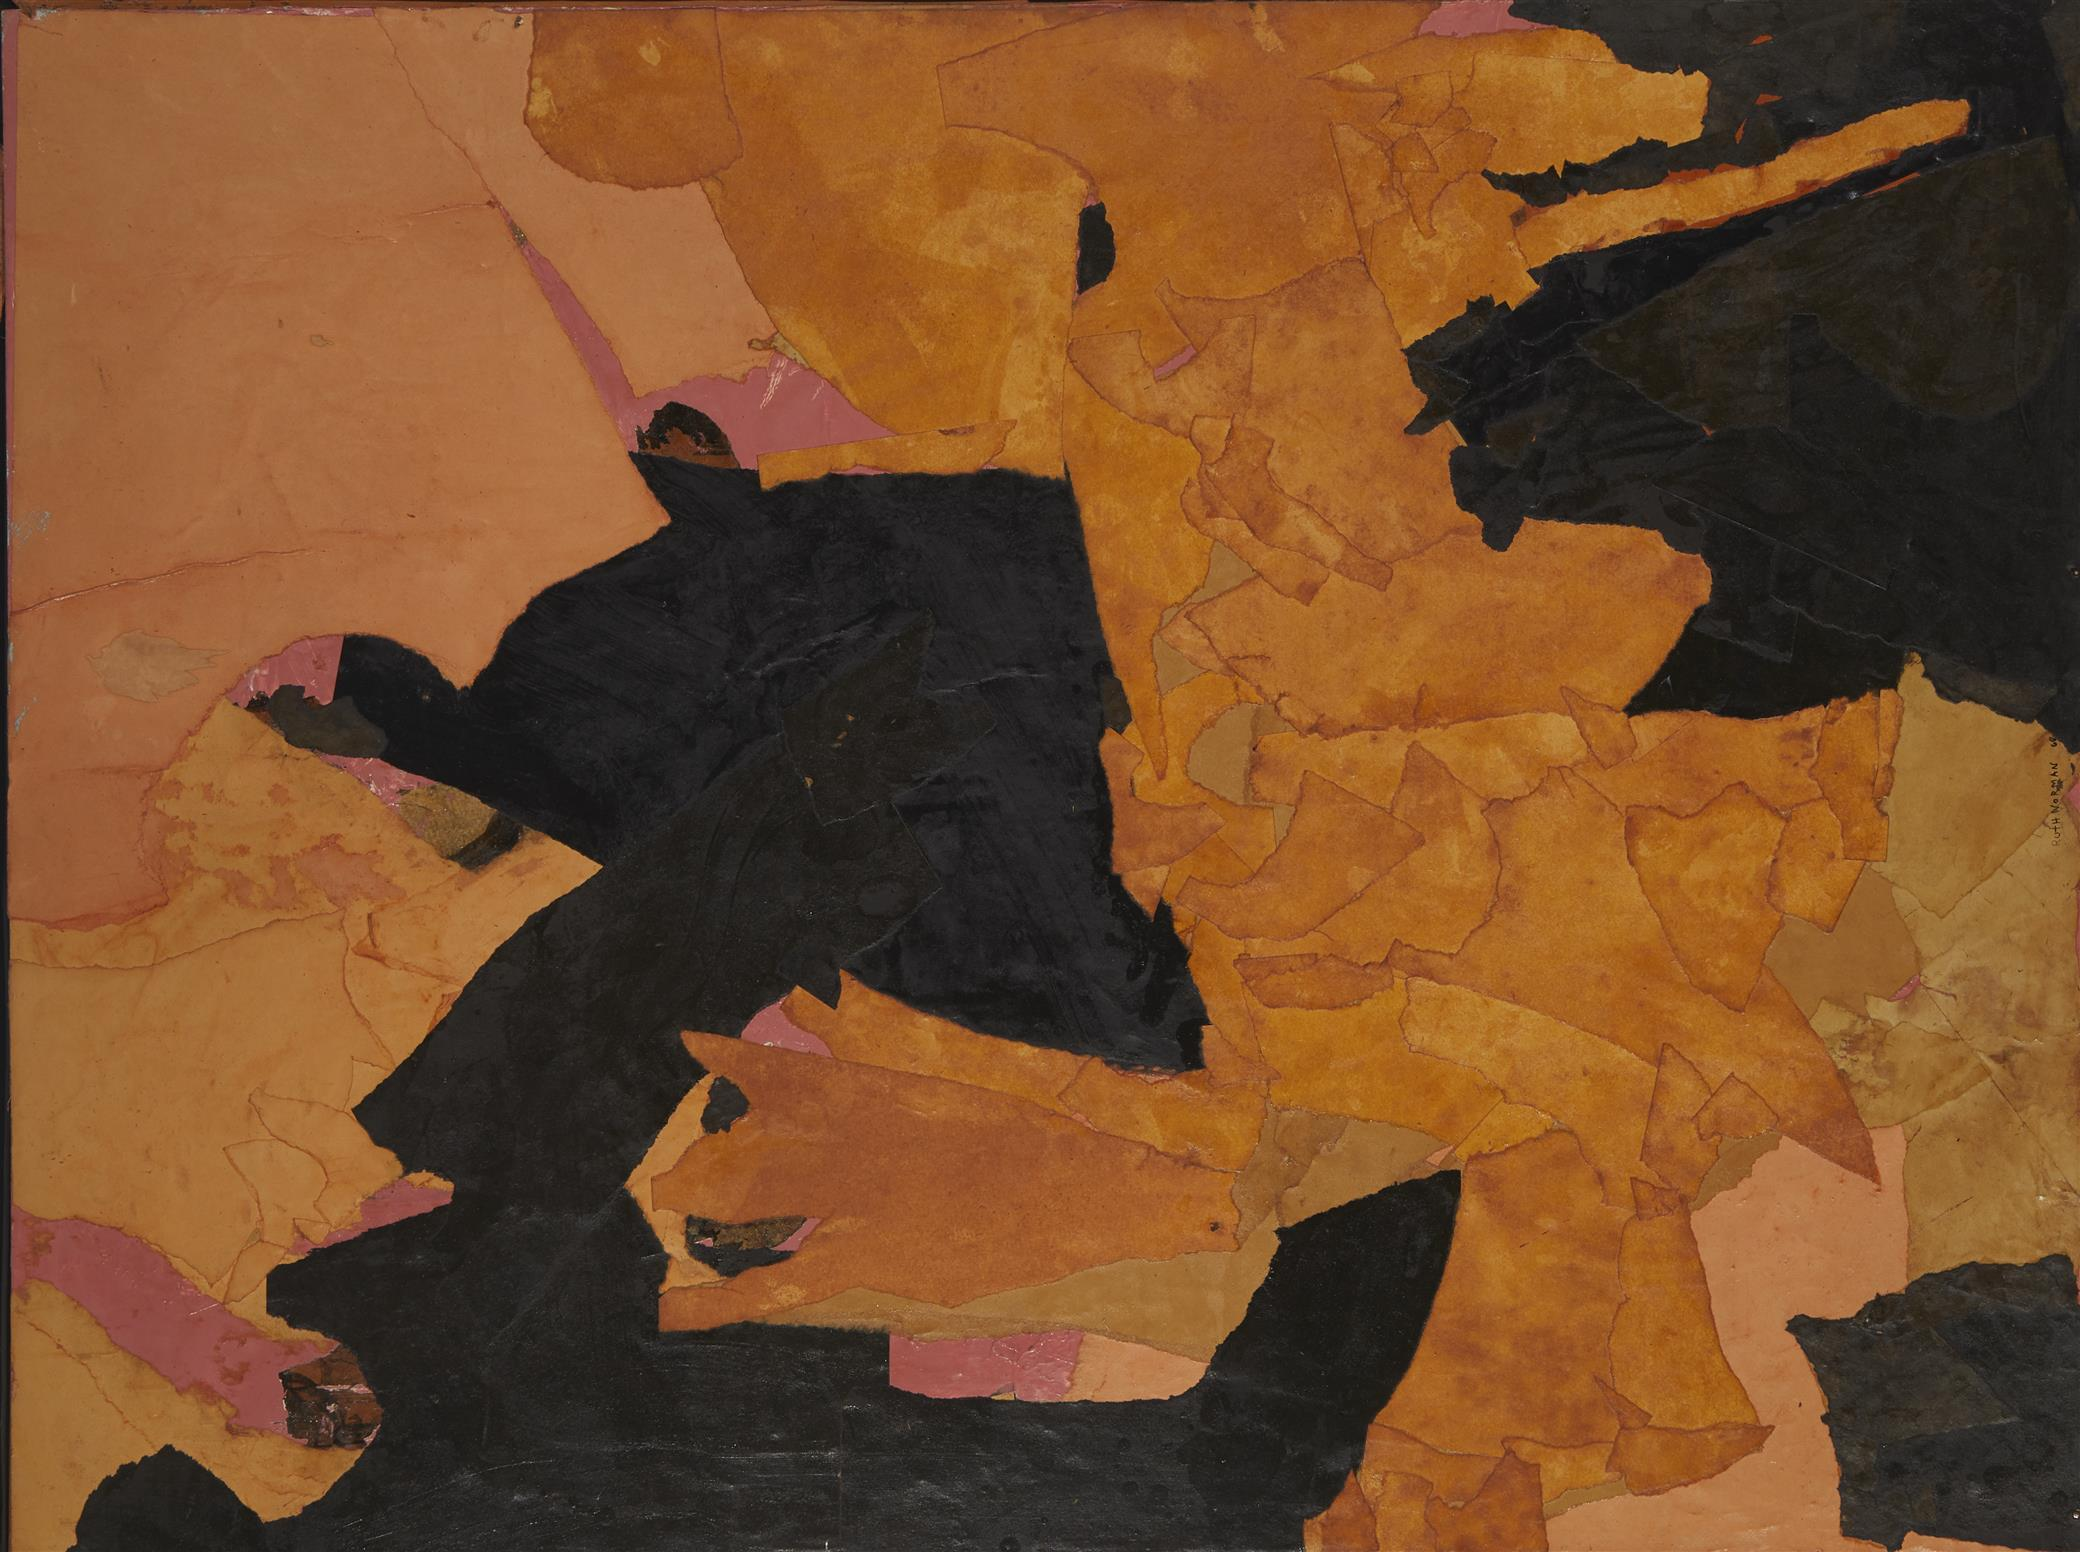 "Ruth Norman, (1909-2010, American), Untitled Orange/Black, 1968, Collage on masonite, 30"" H x 40"" W"